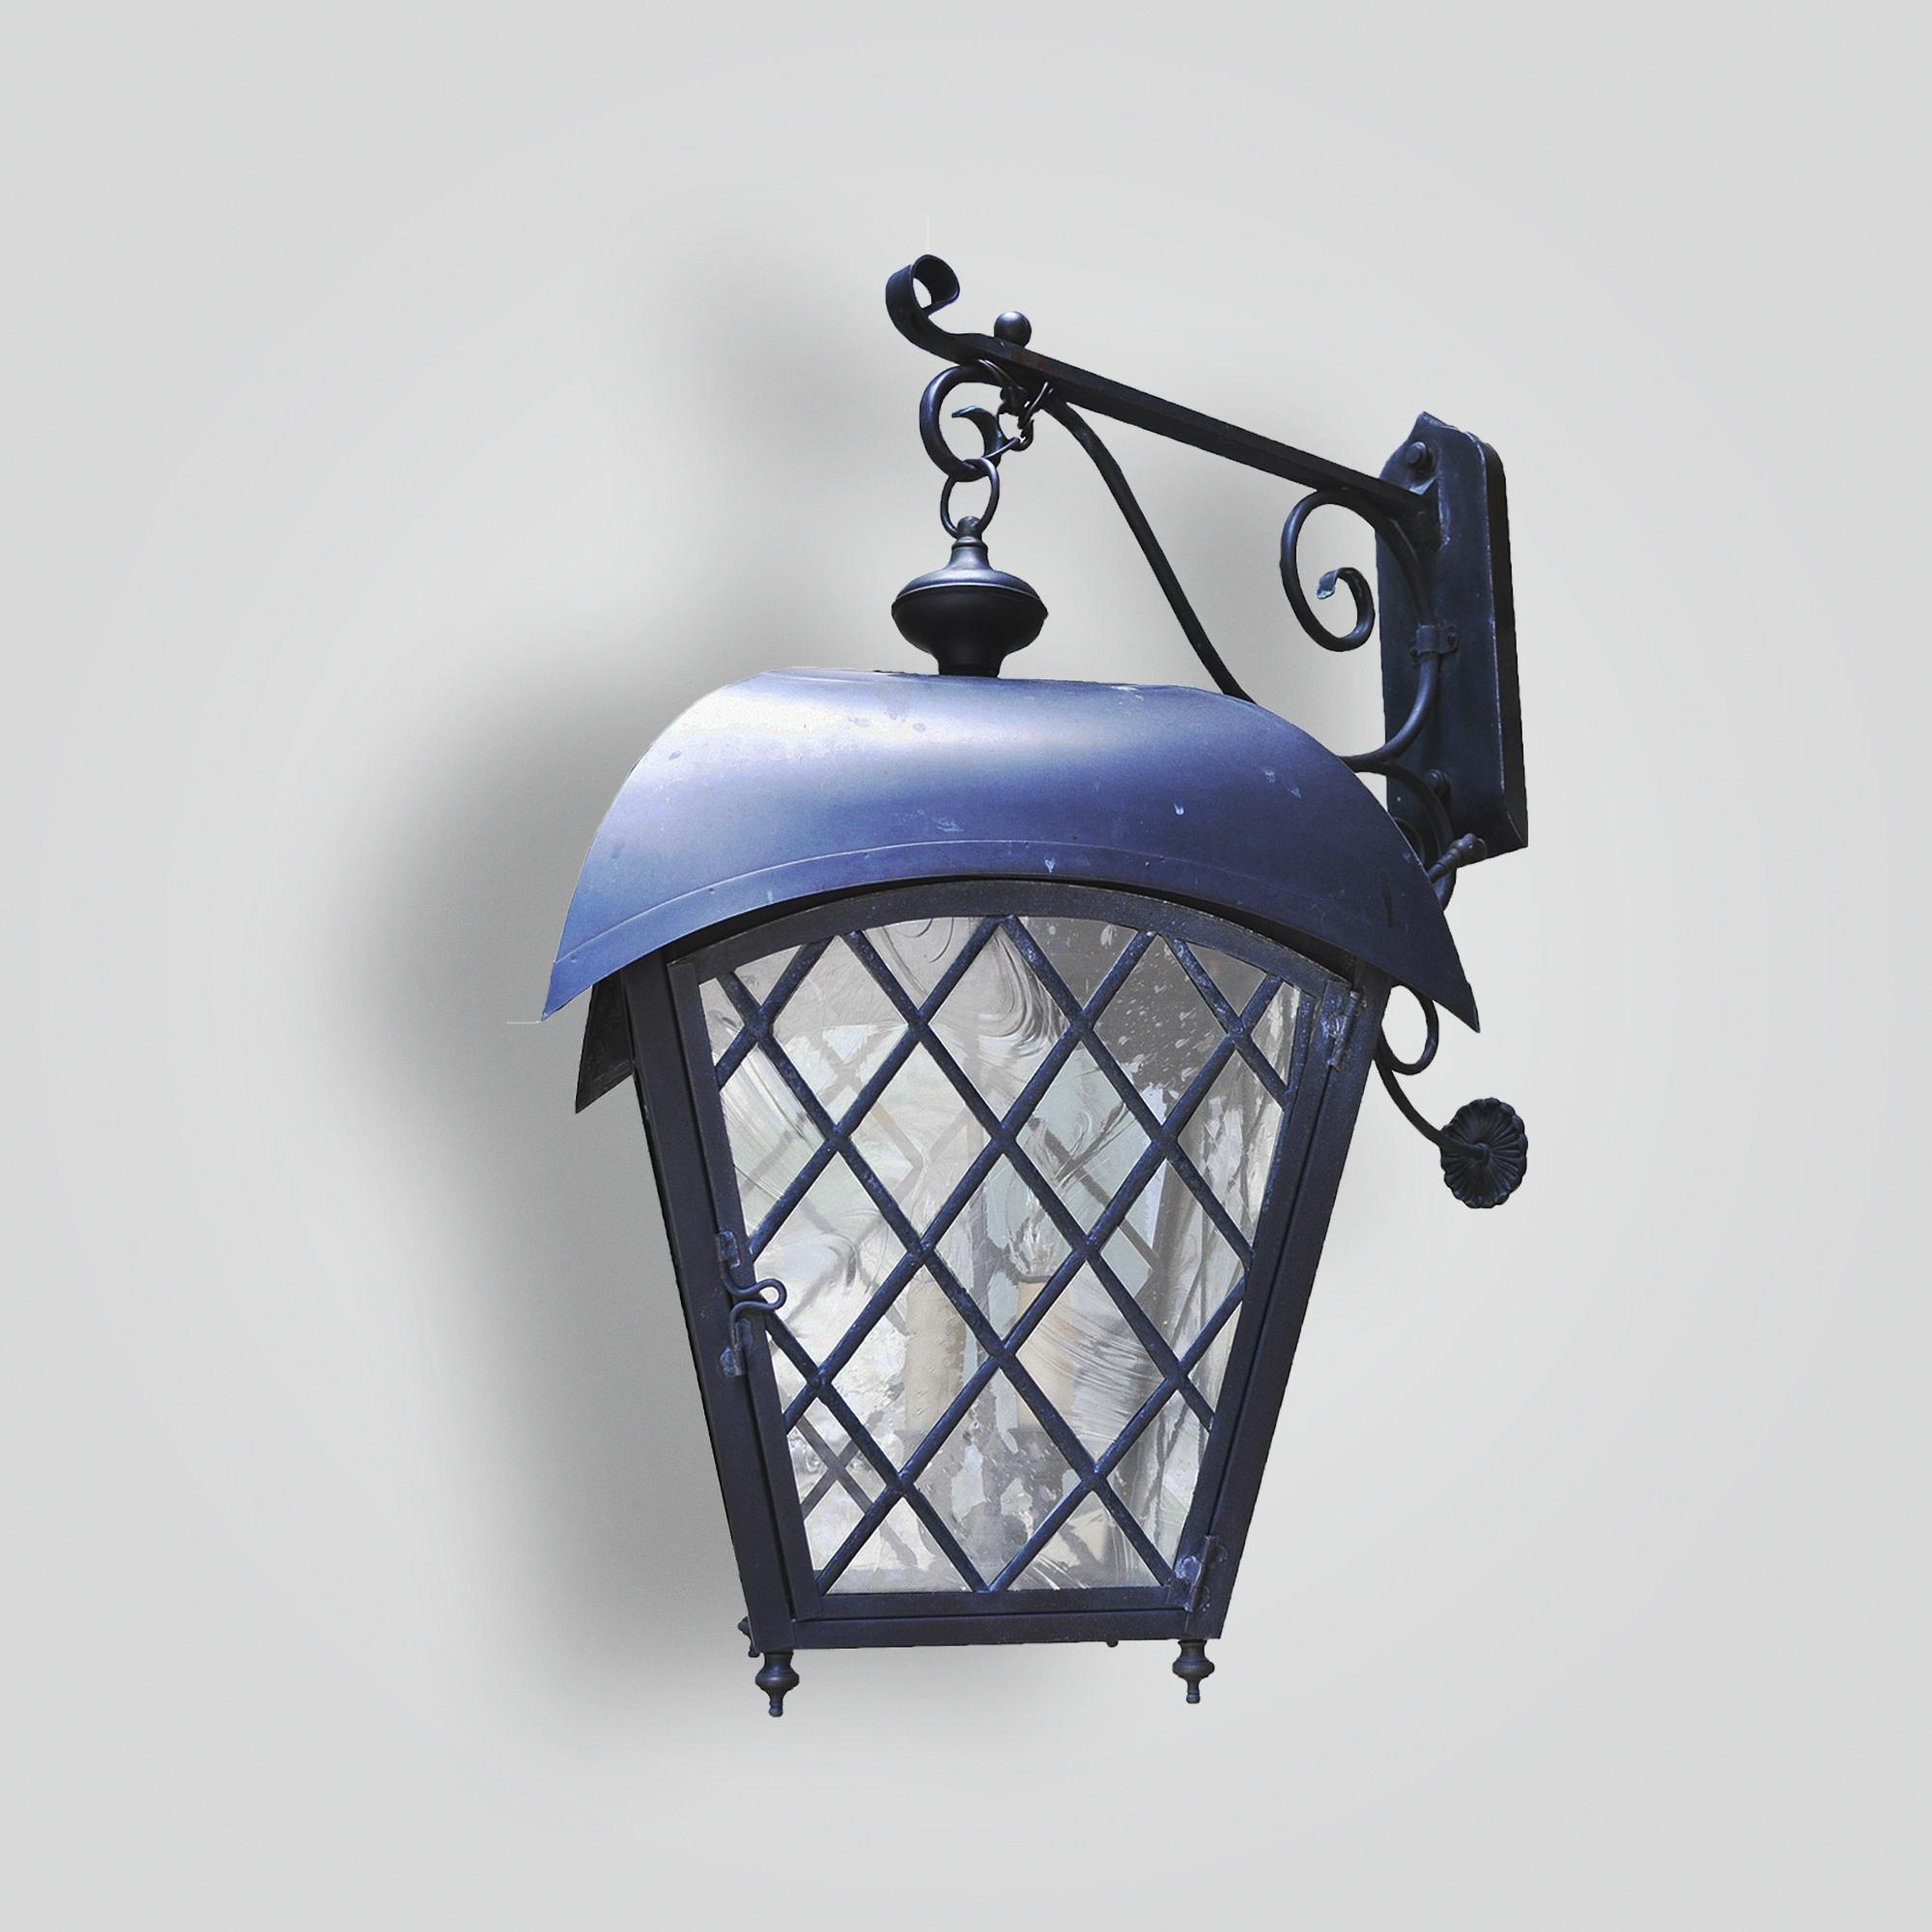 466-cb4-br-w-shba Leaded Glass Arrowhead Wall Lantern – ADG Lighting Collection